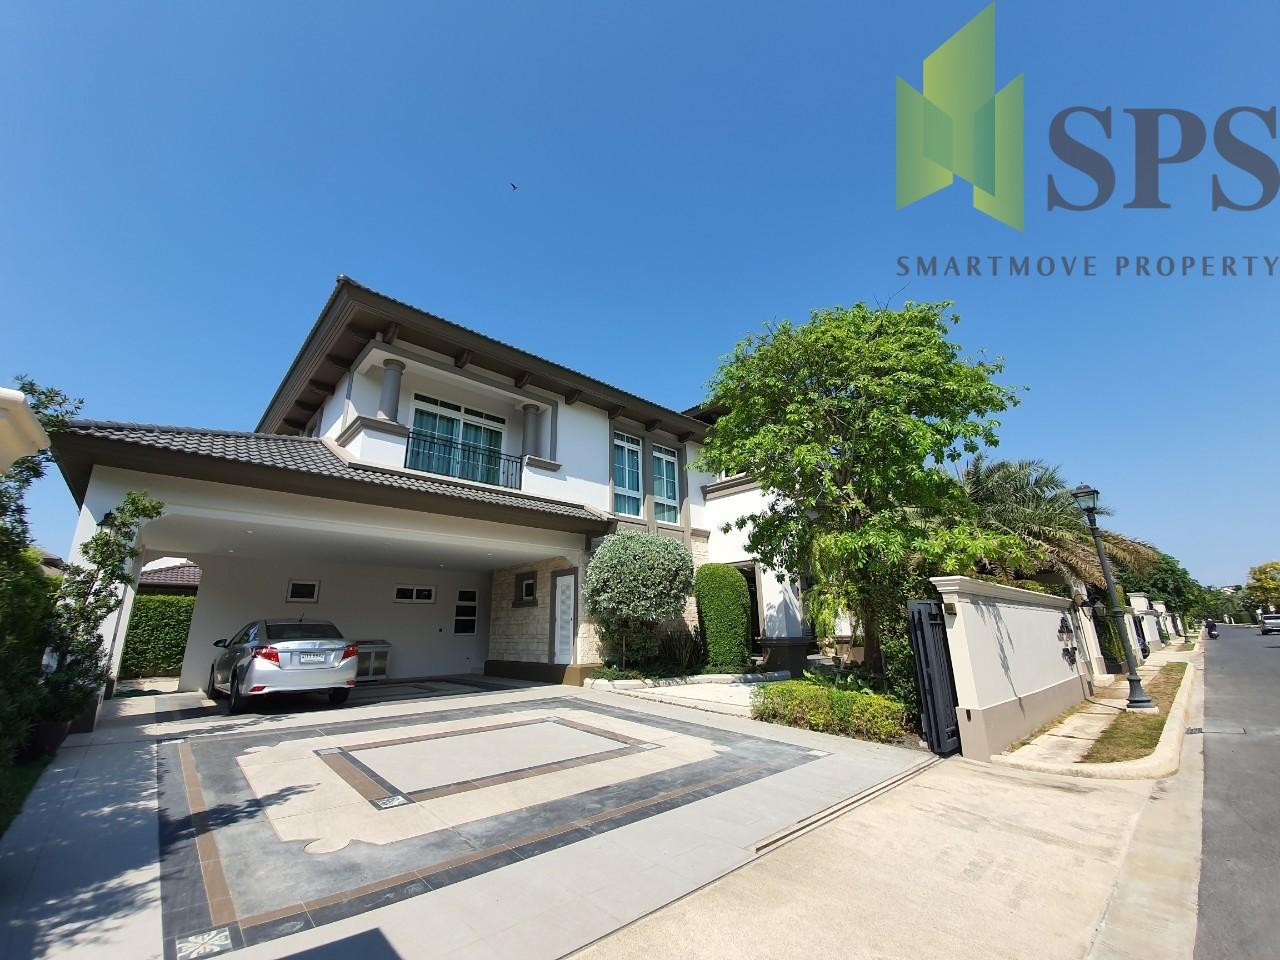 SALE NANTAWAN BANGNA KM.7 Luxury House ขายบ้านหรูโครงการนันวัน บางนา กม.7 ( SPSEVE-H679 )